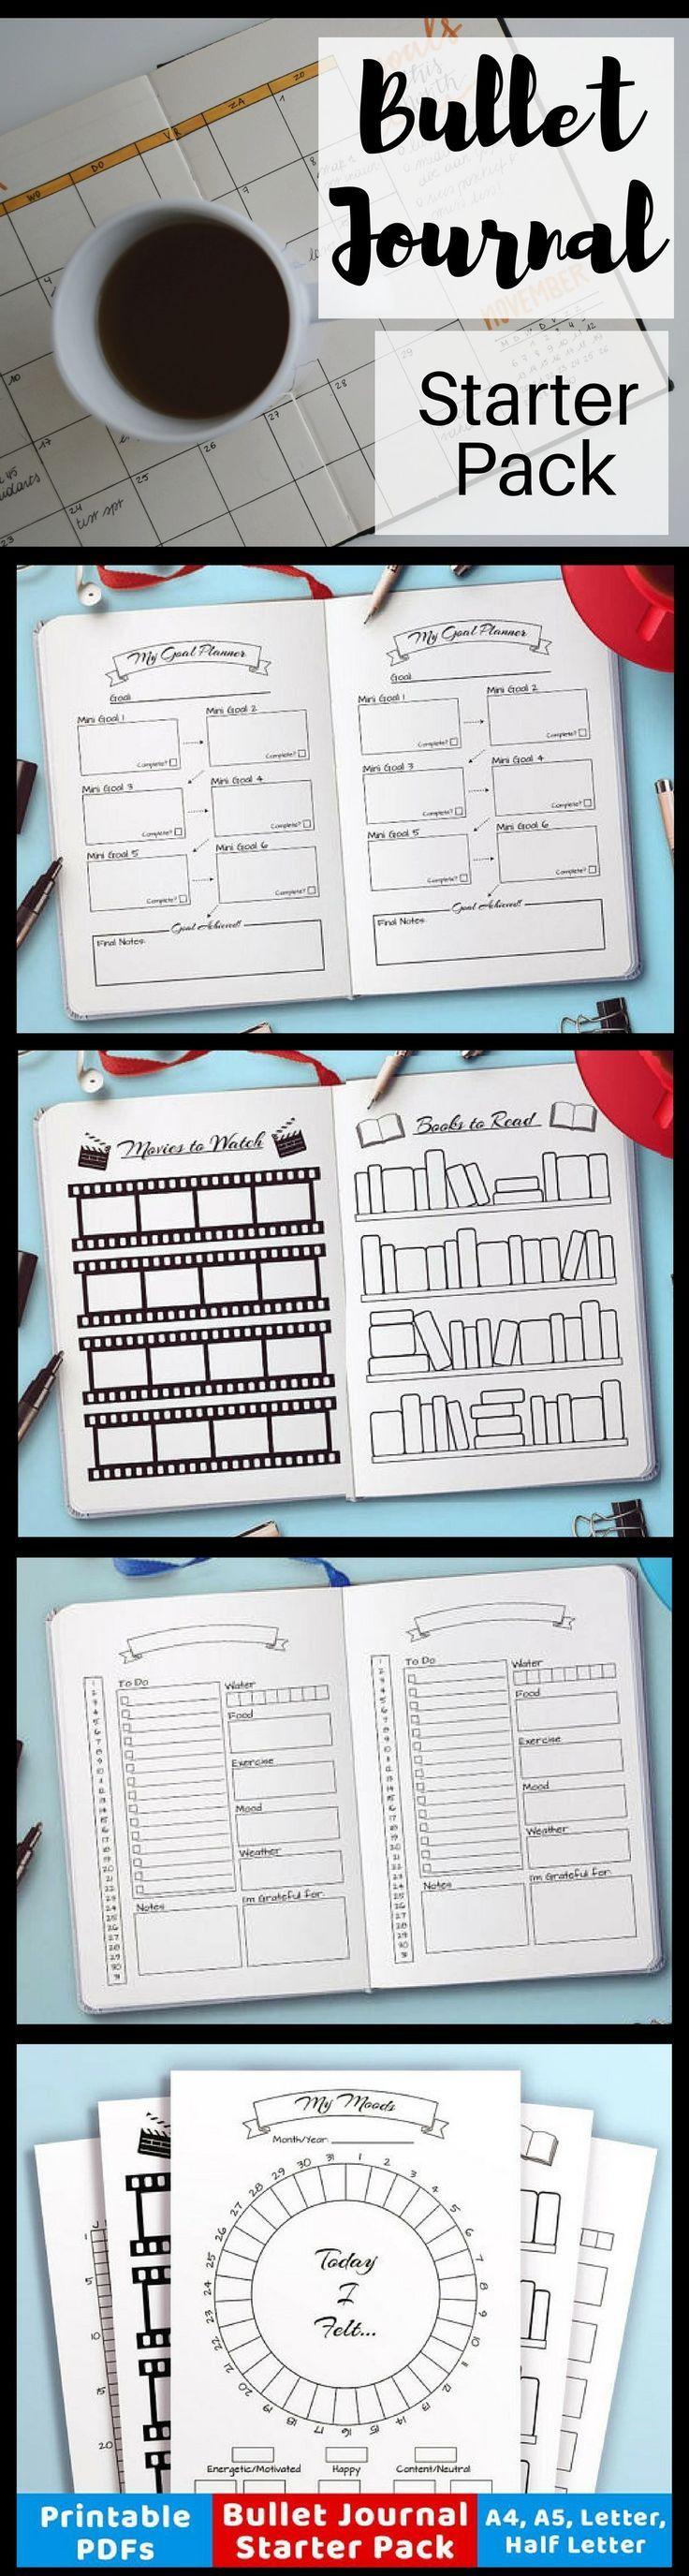 Starter pack of printables for bullet journals. Great way to get started! #bulletjournaling #planner #ad #printable